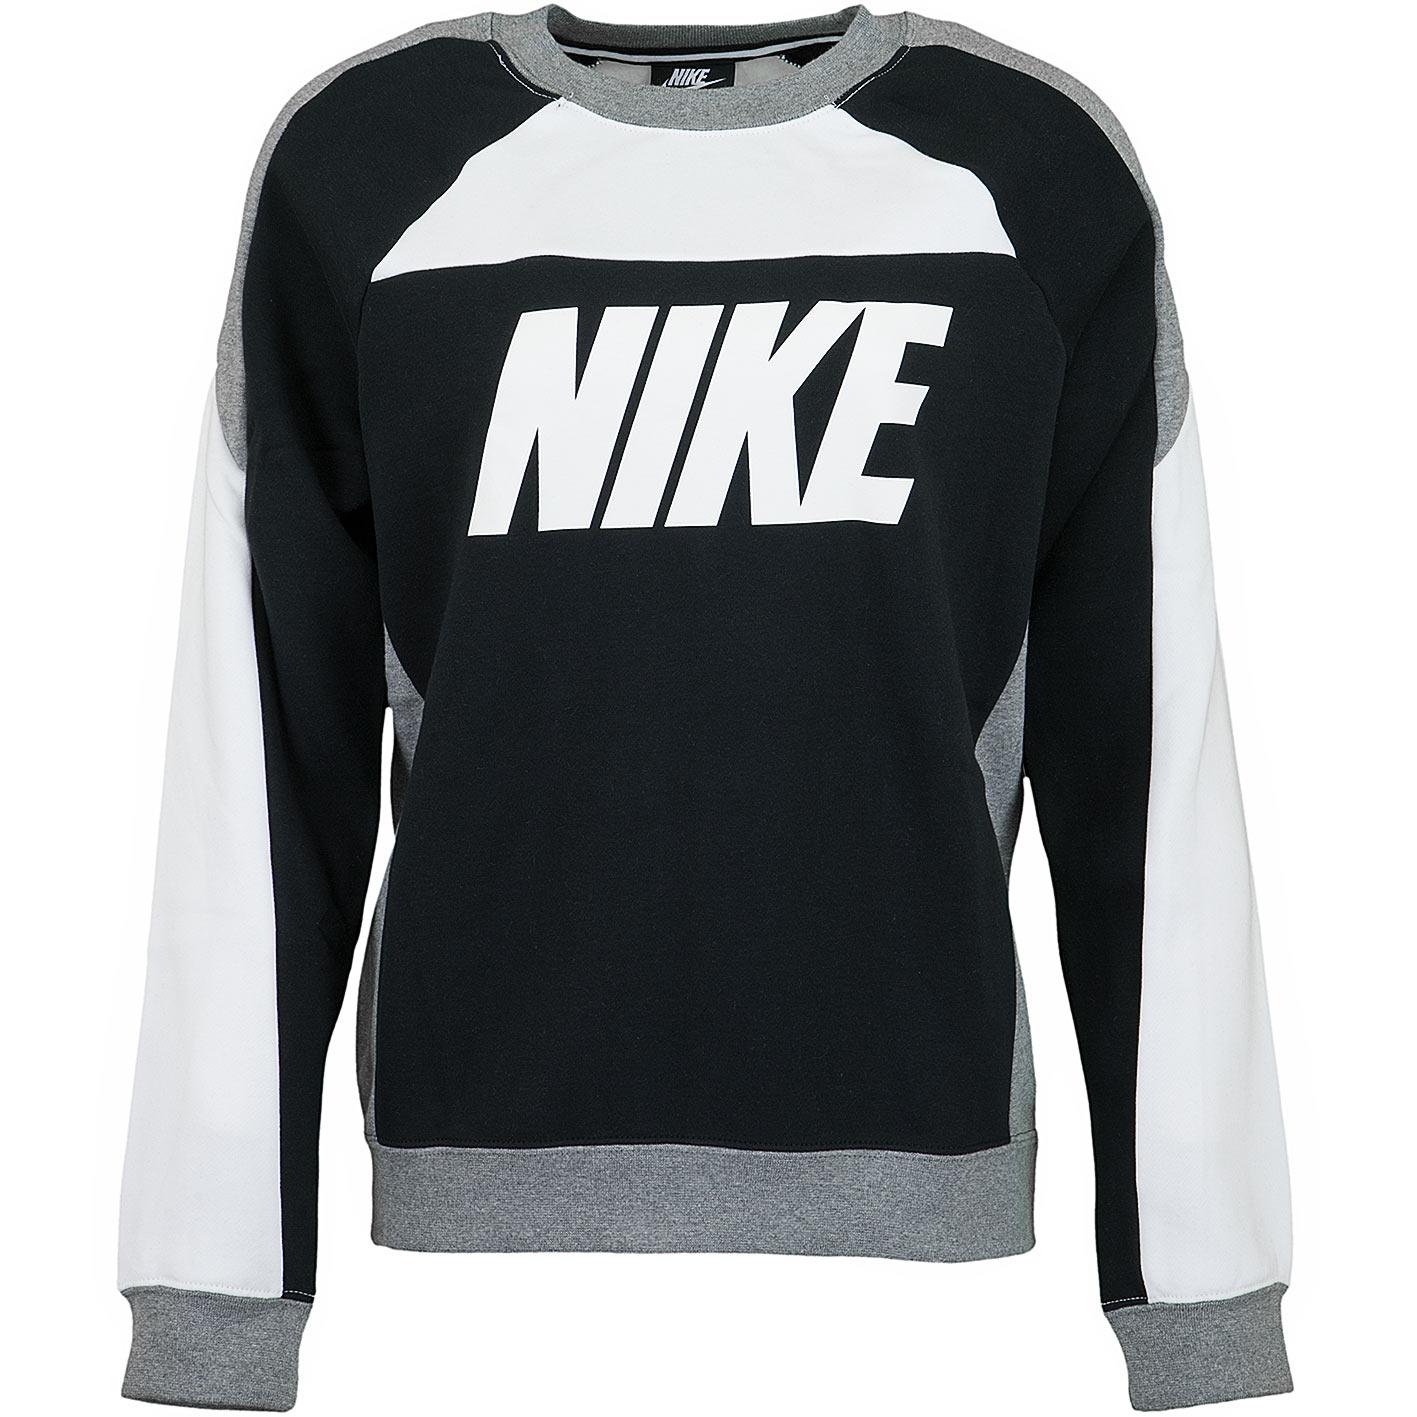 Nike Damen Sweatshirt CB Fleece weißschwarz